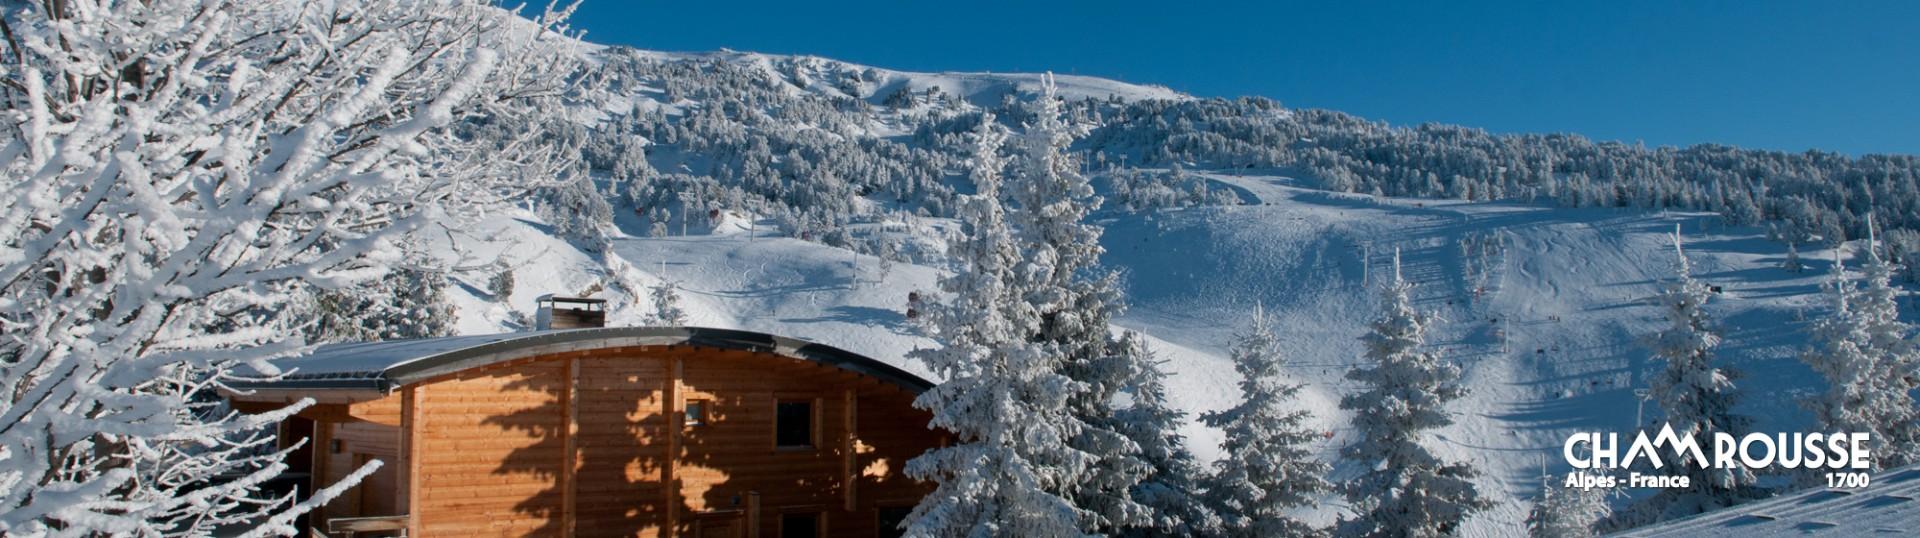 Hébergement hiver Chamrousse